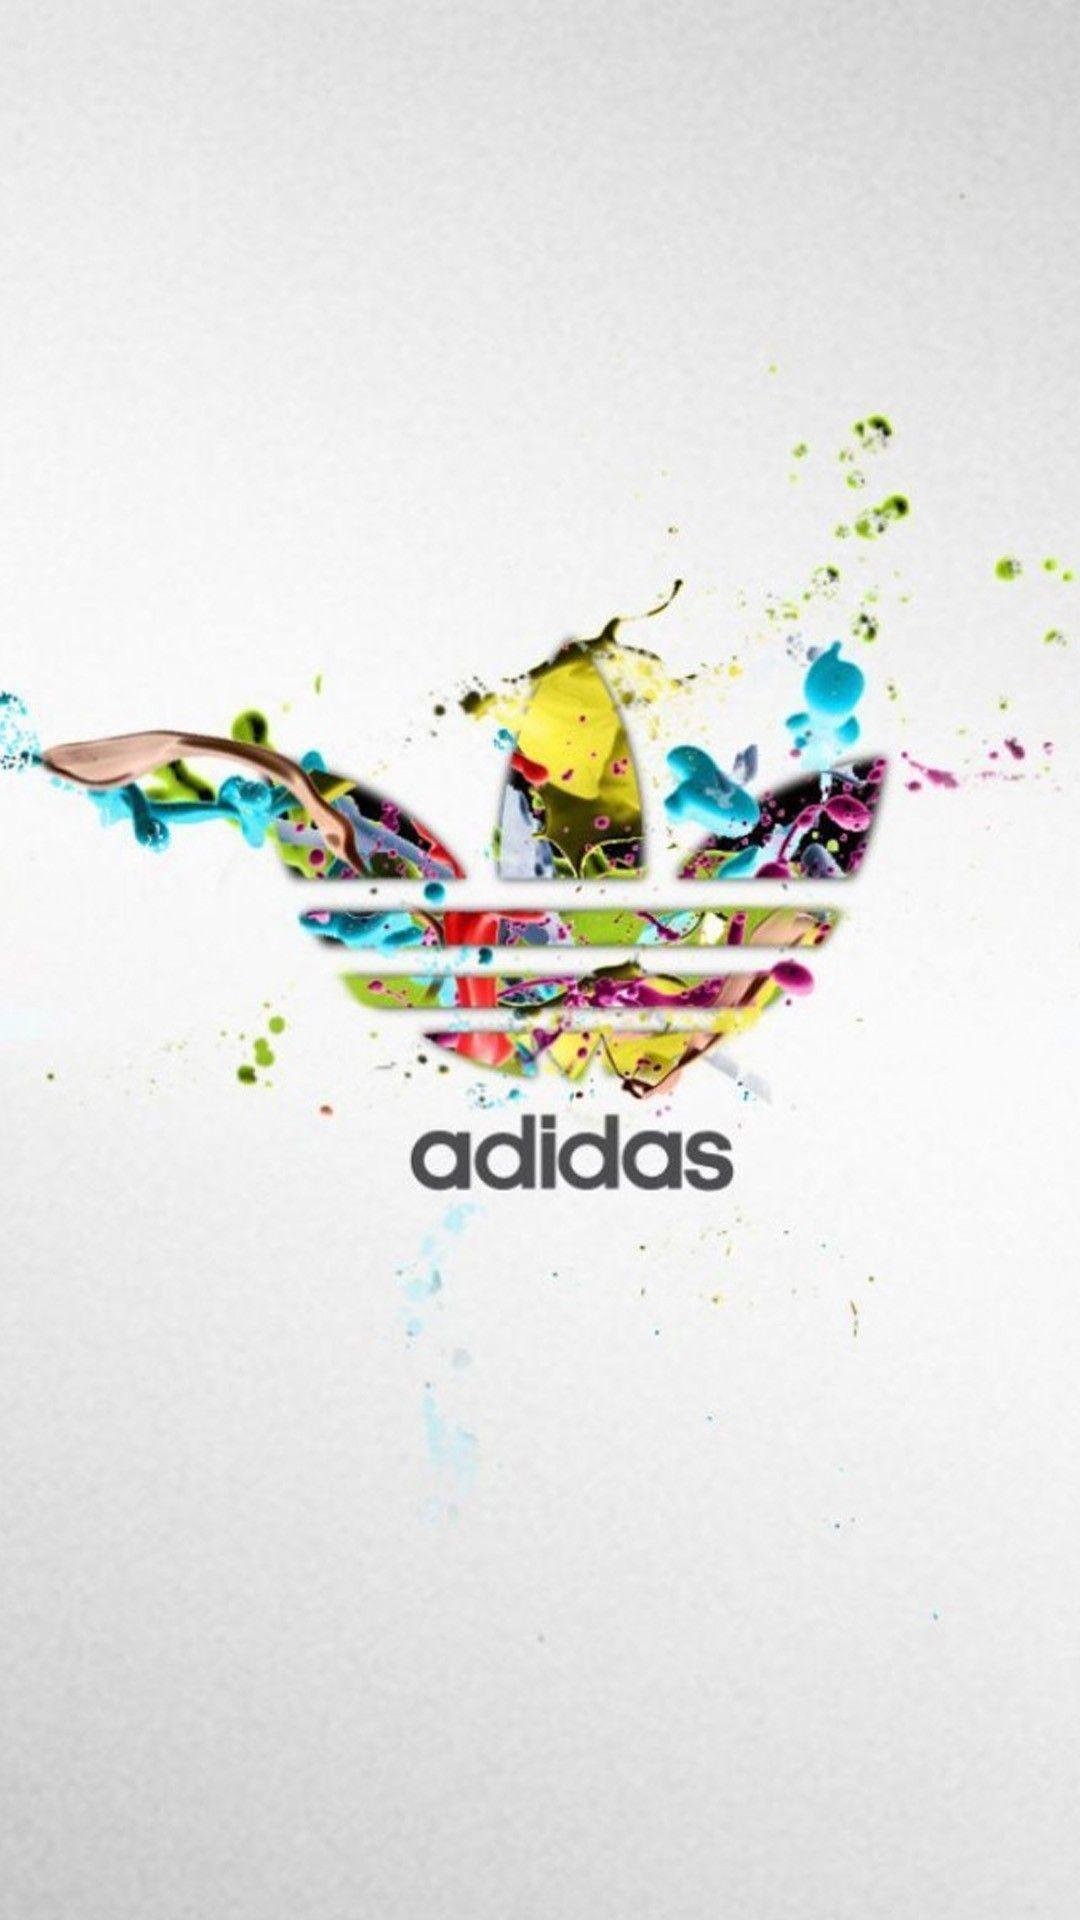 Res: 1080x1920, Sports iPhone 6 Plus Wallpapers - Adidas Colorful Logo Splash iPhone 6 Plus  HD Wallpaper